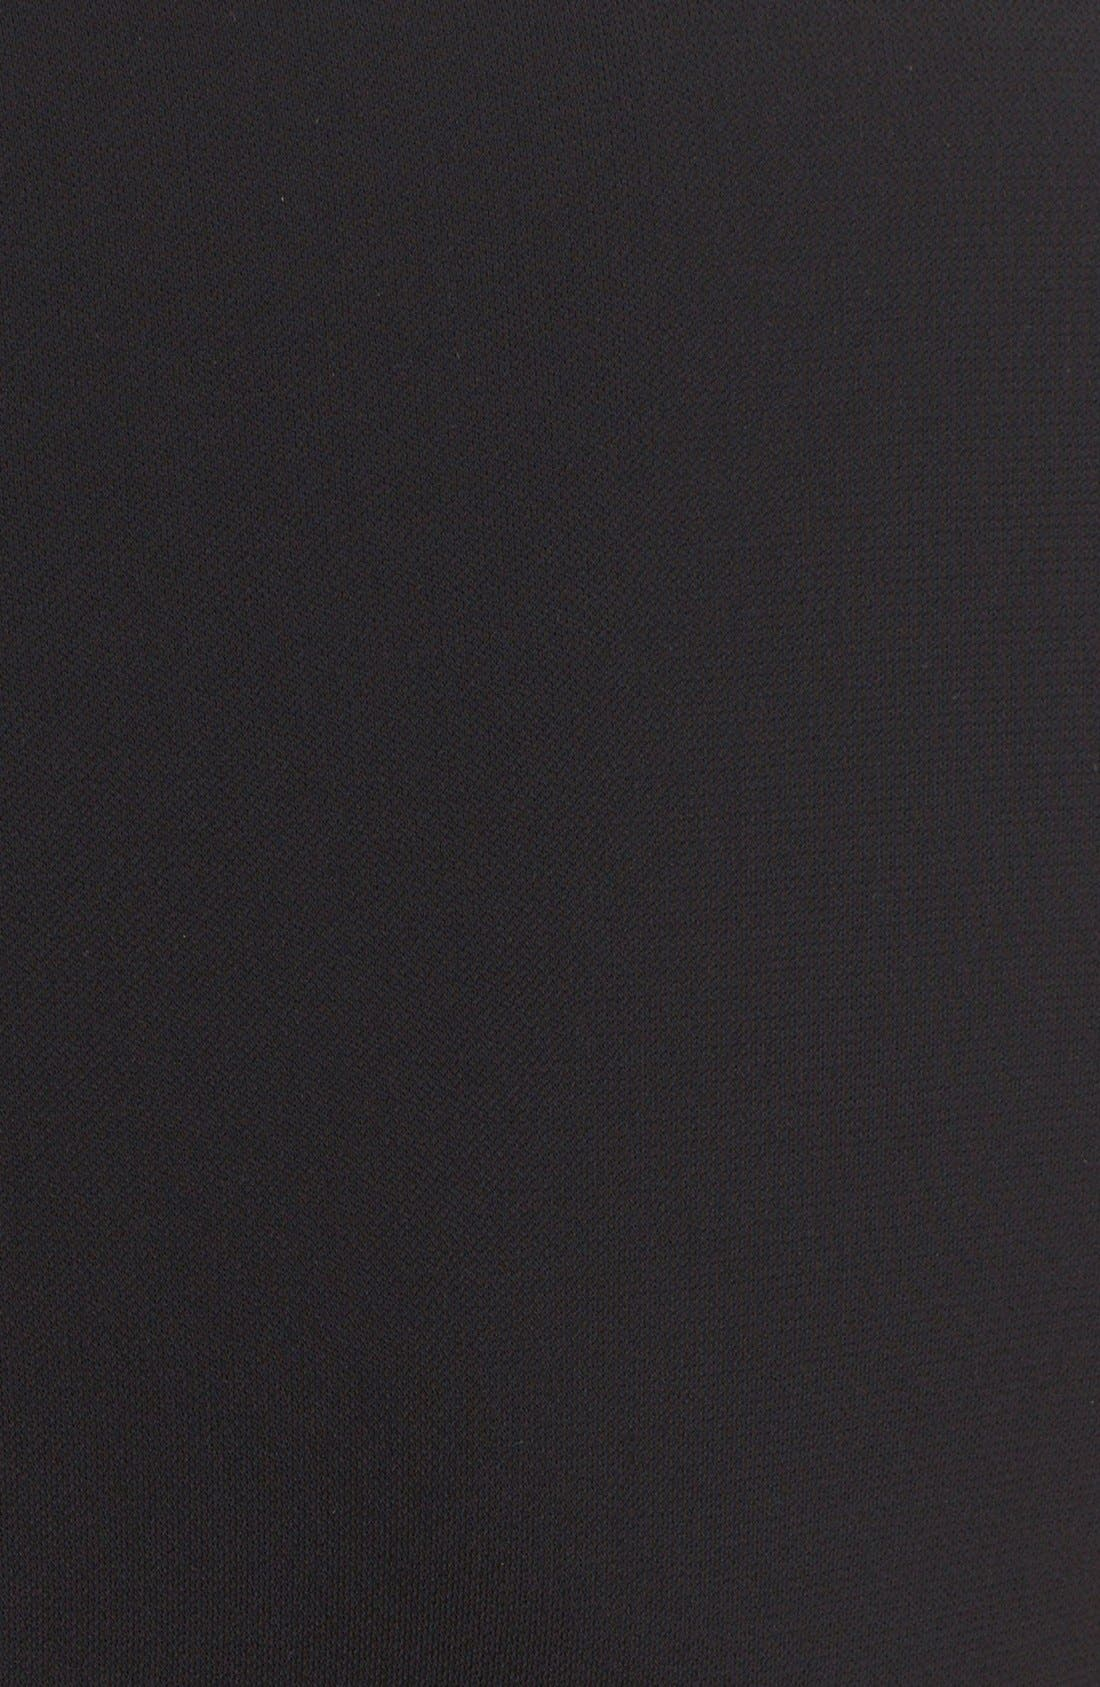 Alternate Image 3  - Michael KorsCap Sleeve Illusion JerseyGown